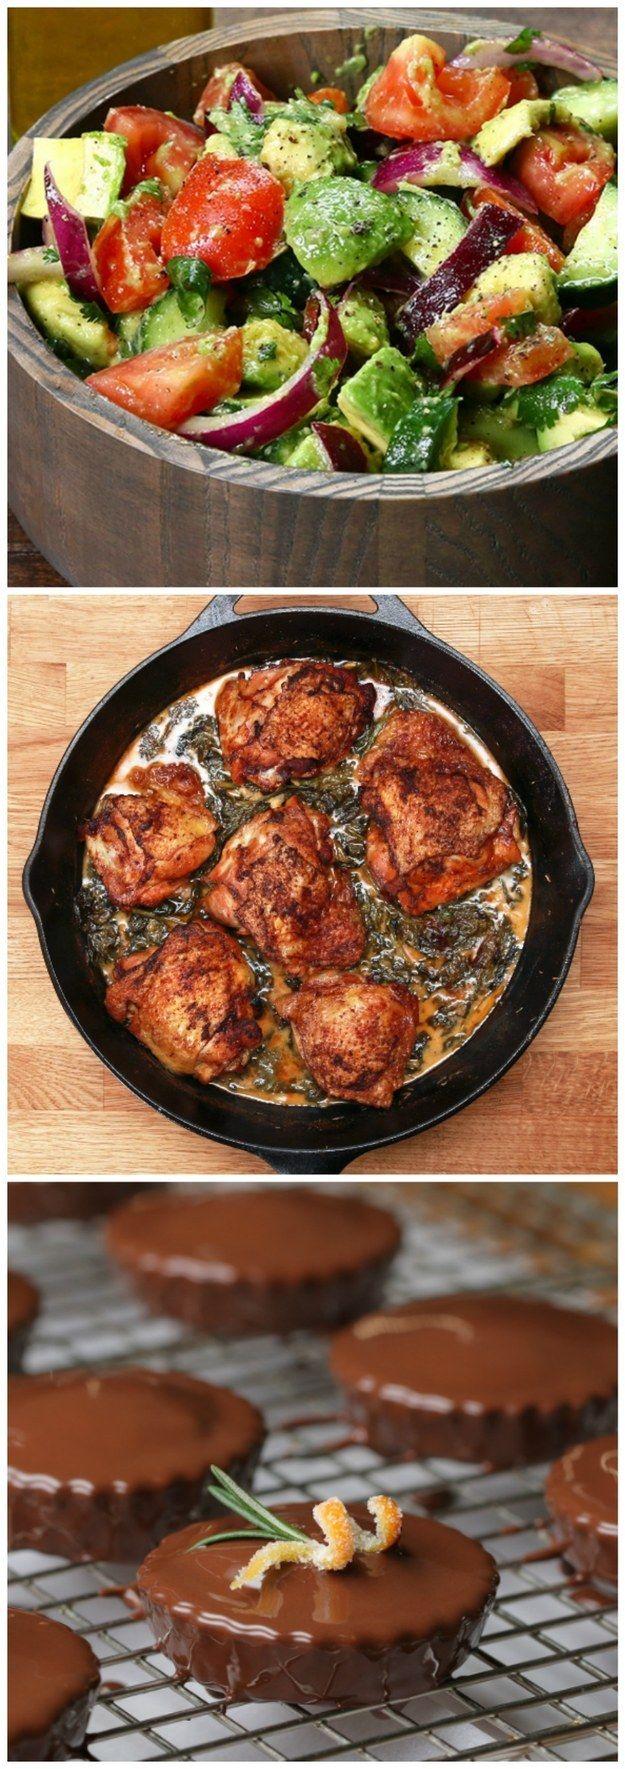 #TastyTuesday: Avocado, Cucumber, Tomato Salad, Creamy Lemon Butter Chicken, and…